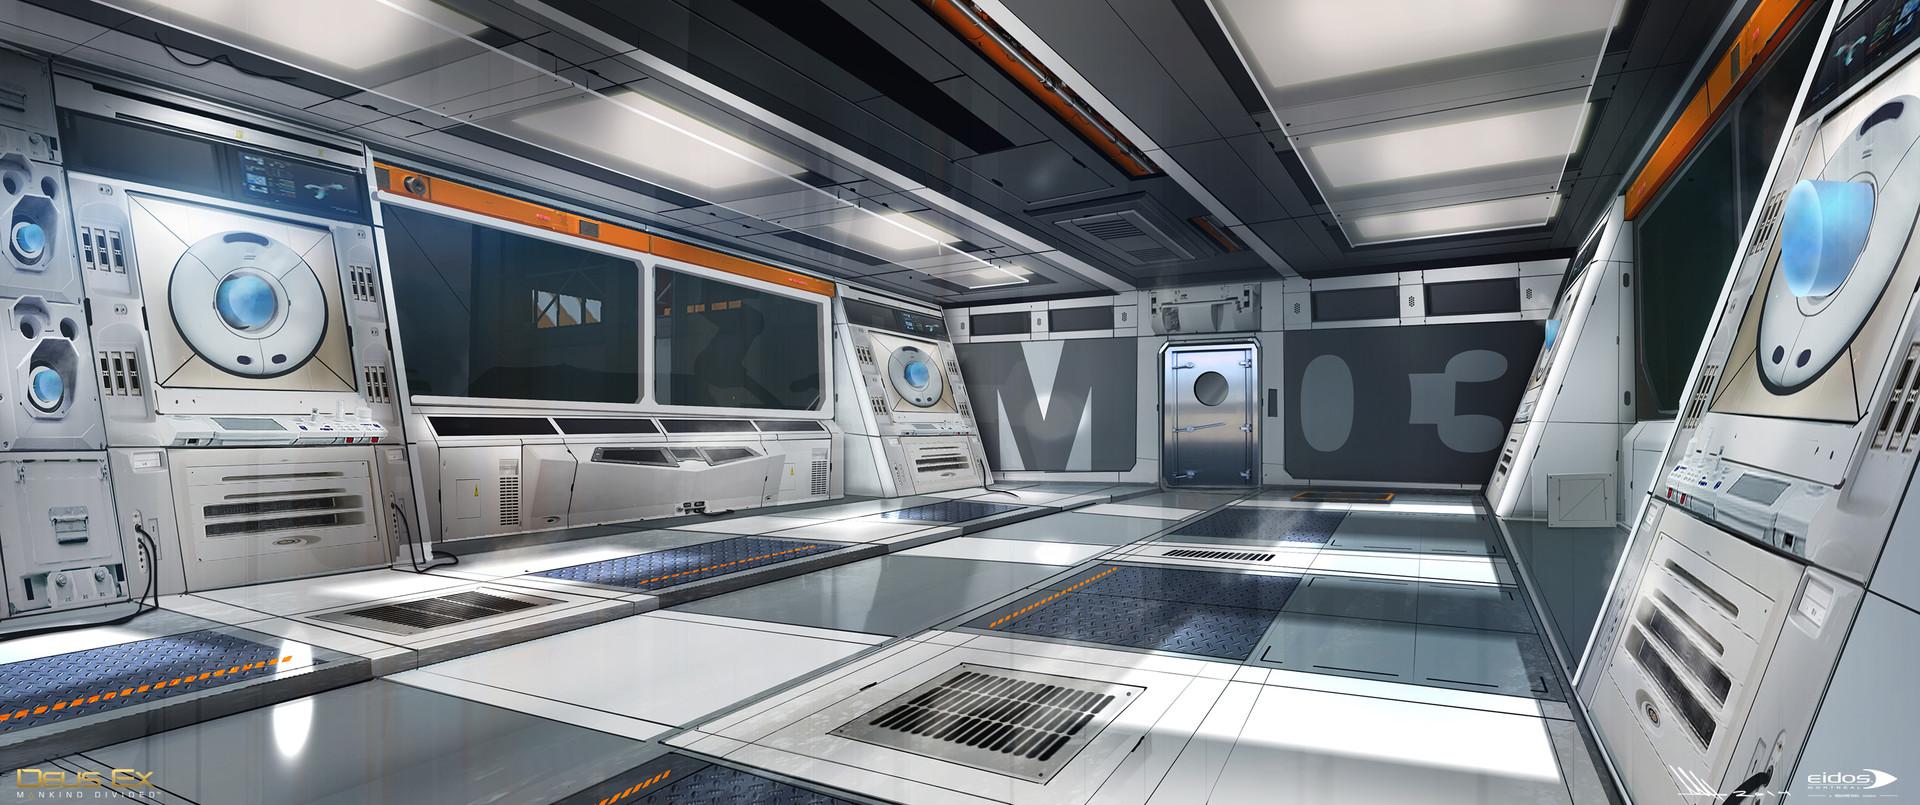 Mathieu latour duhaime module int 01a